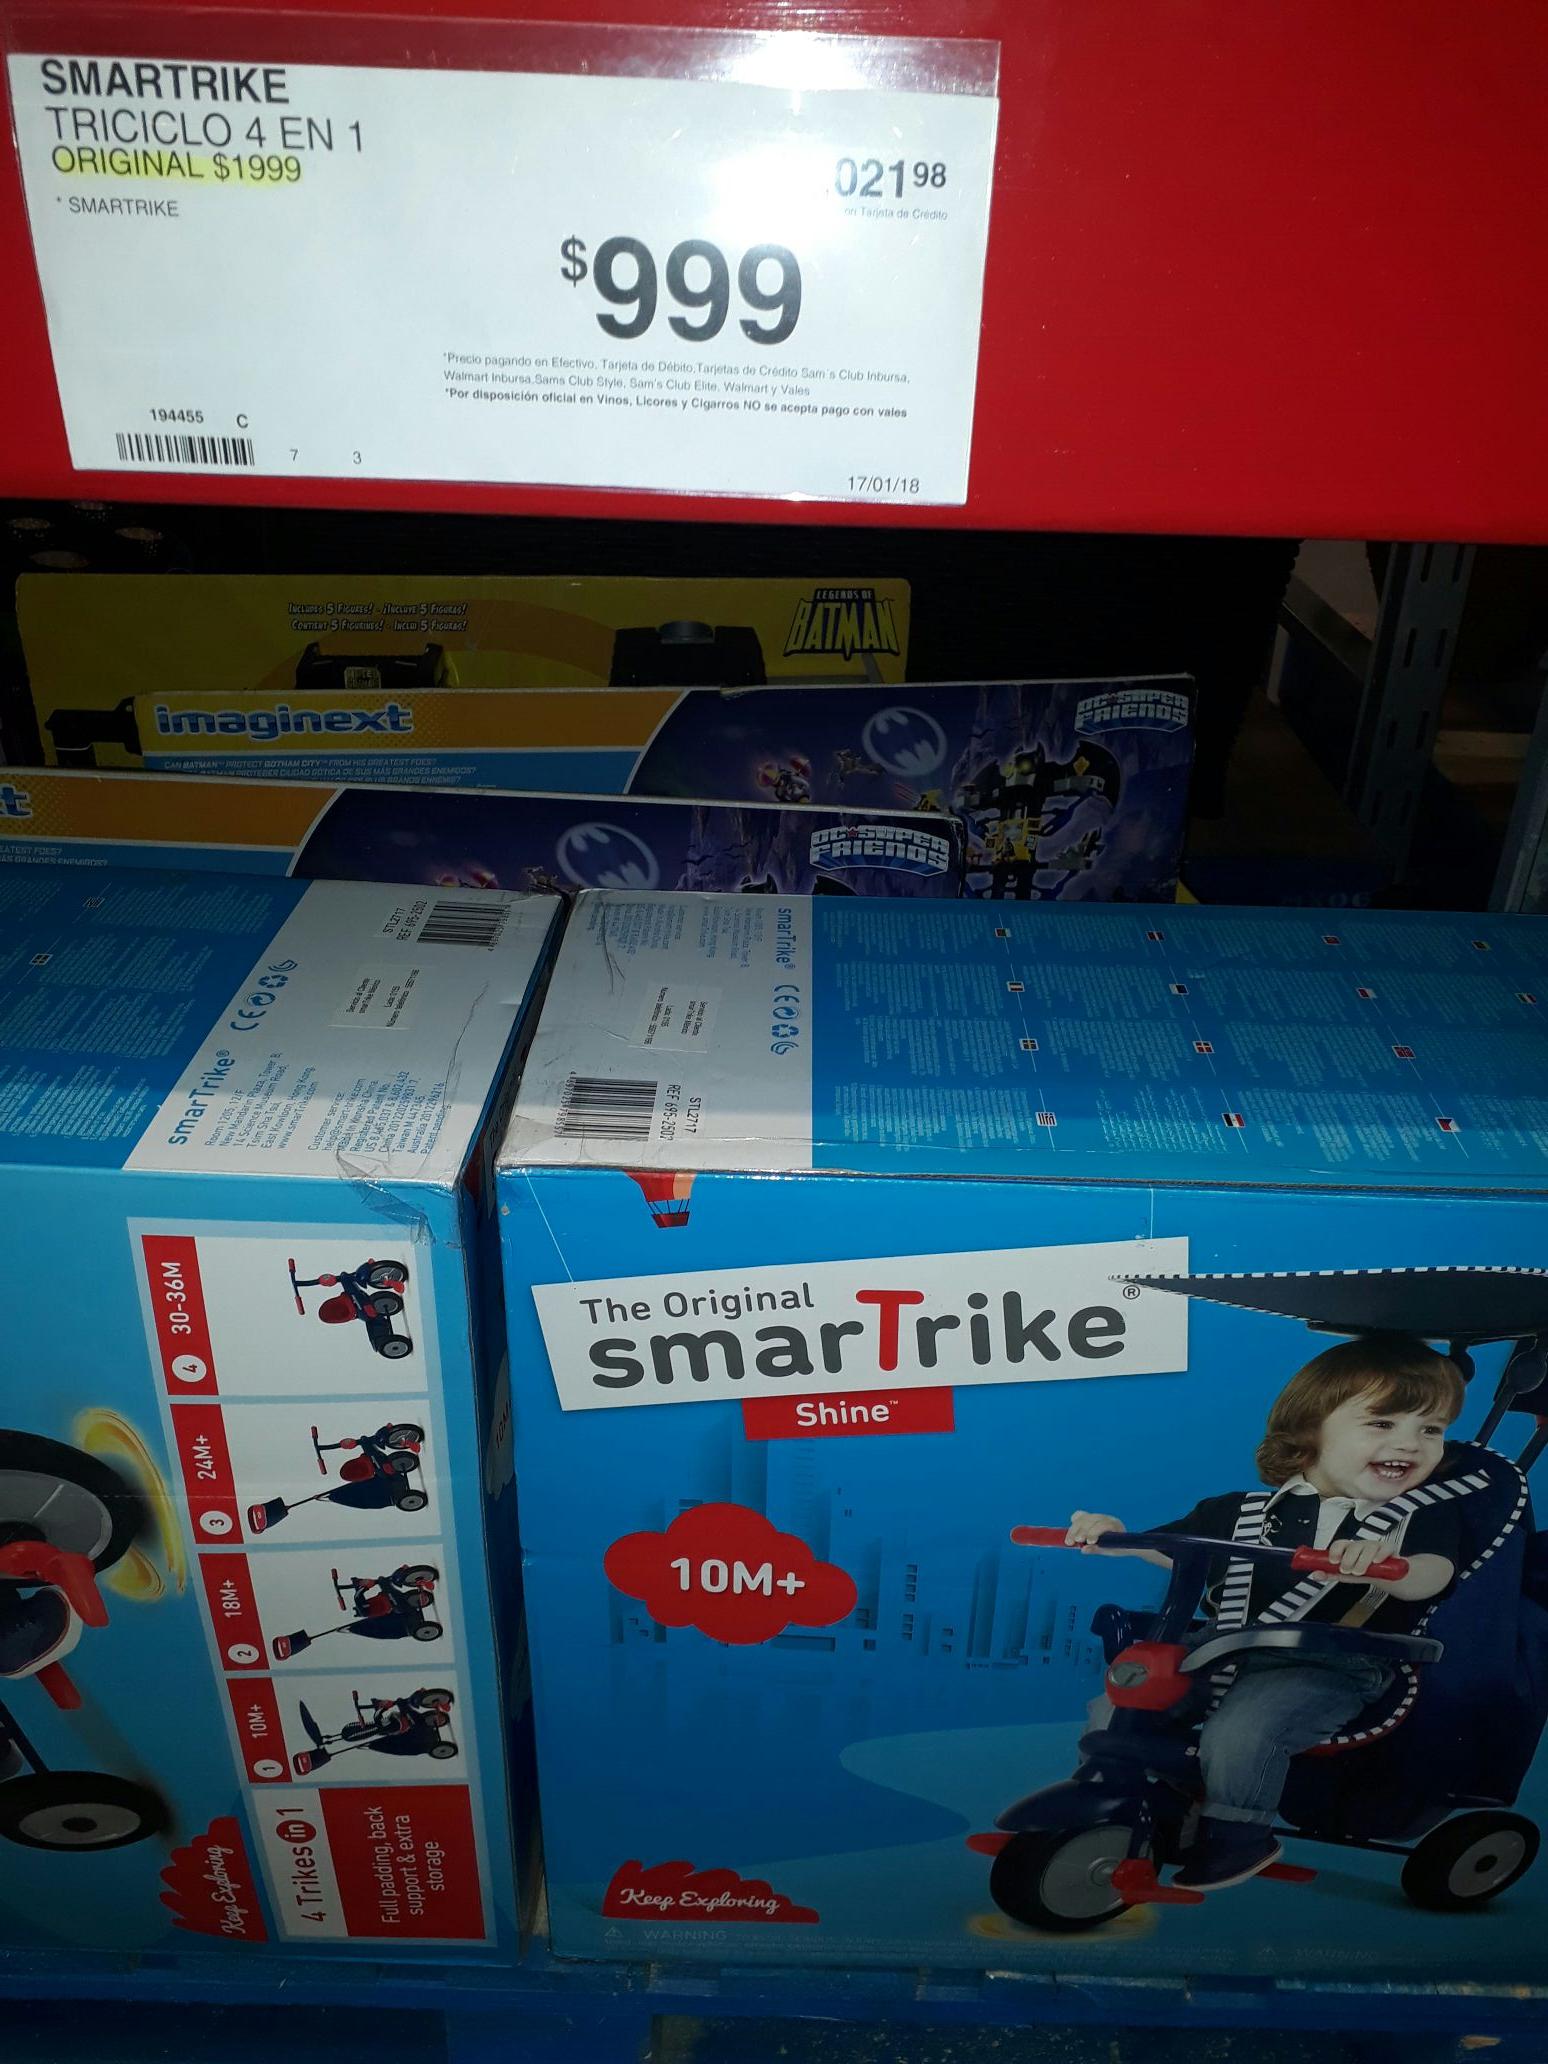 Sam's Club: Triciclo Smartrike a $999